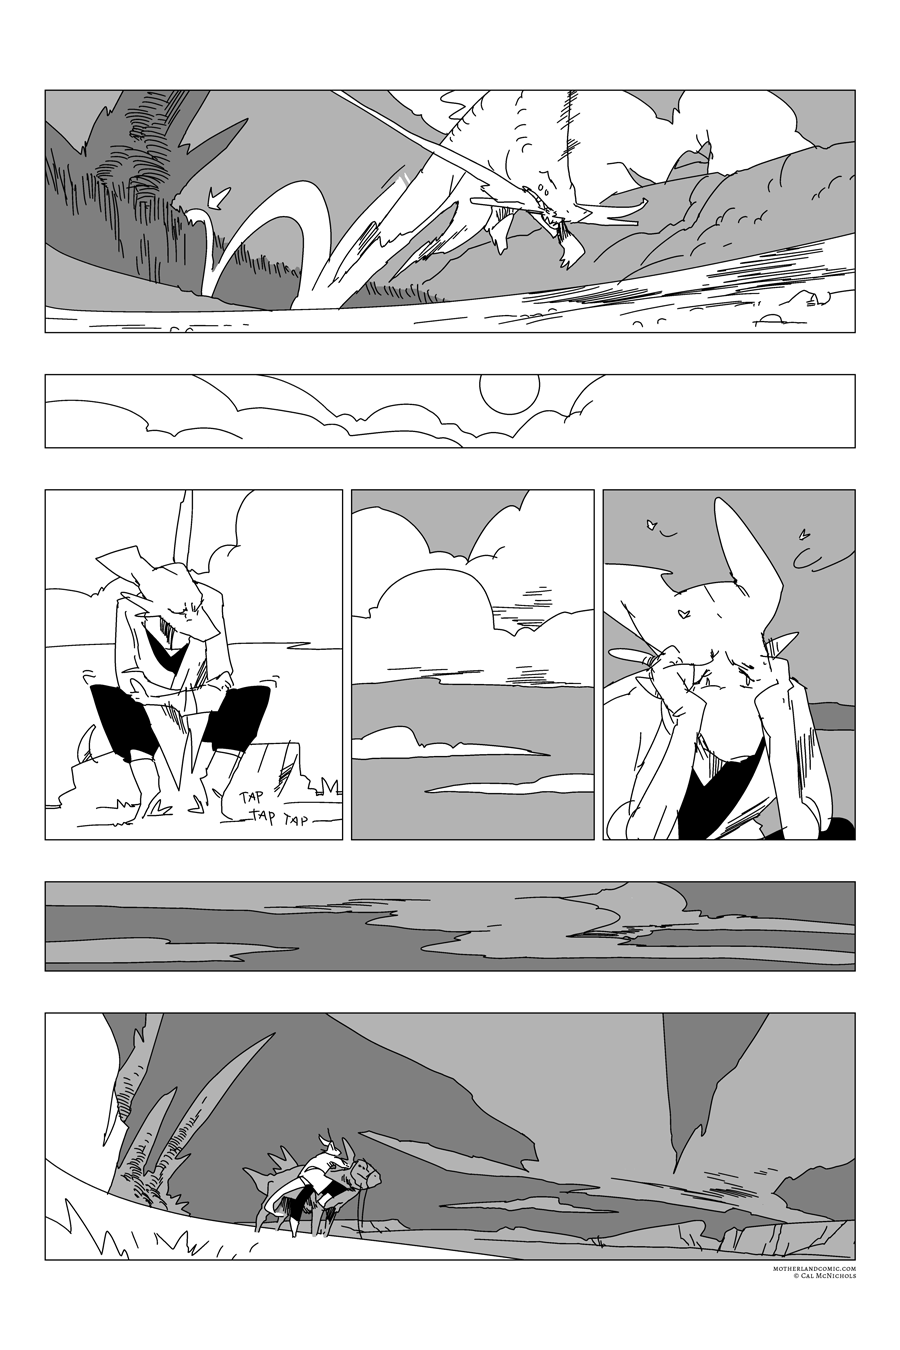 pg 121